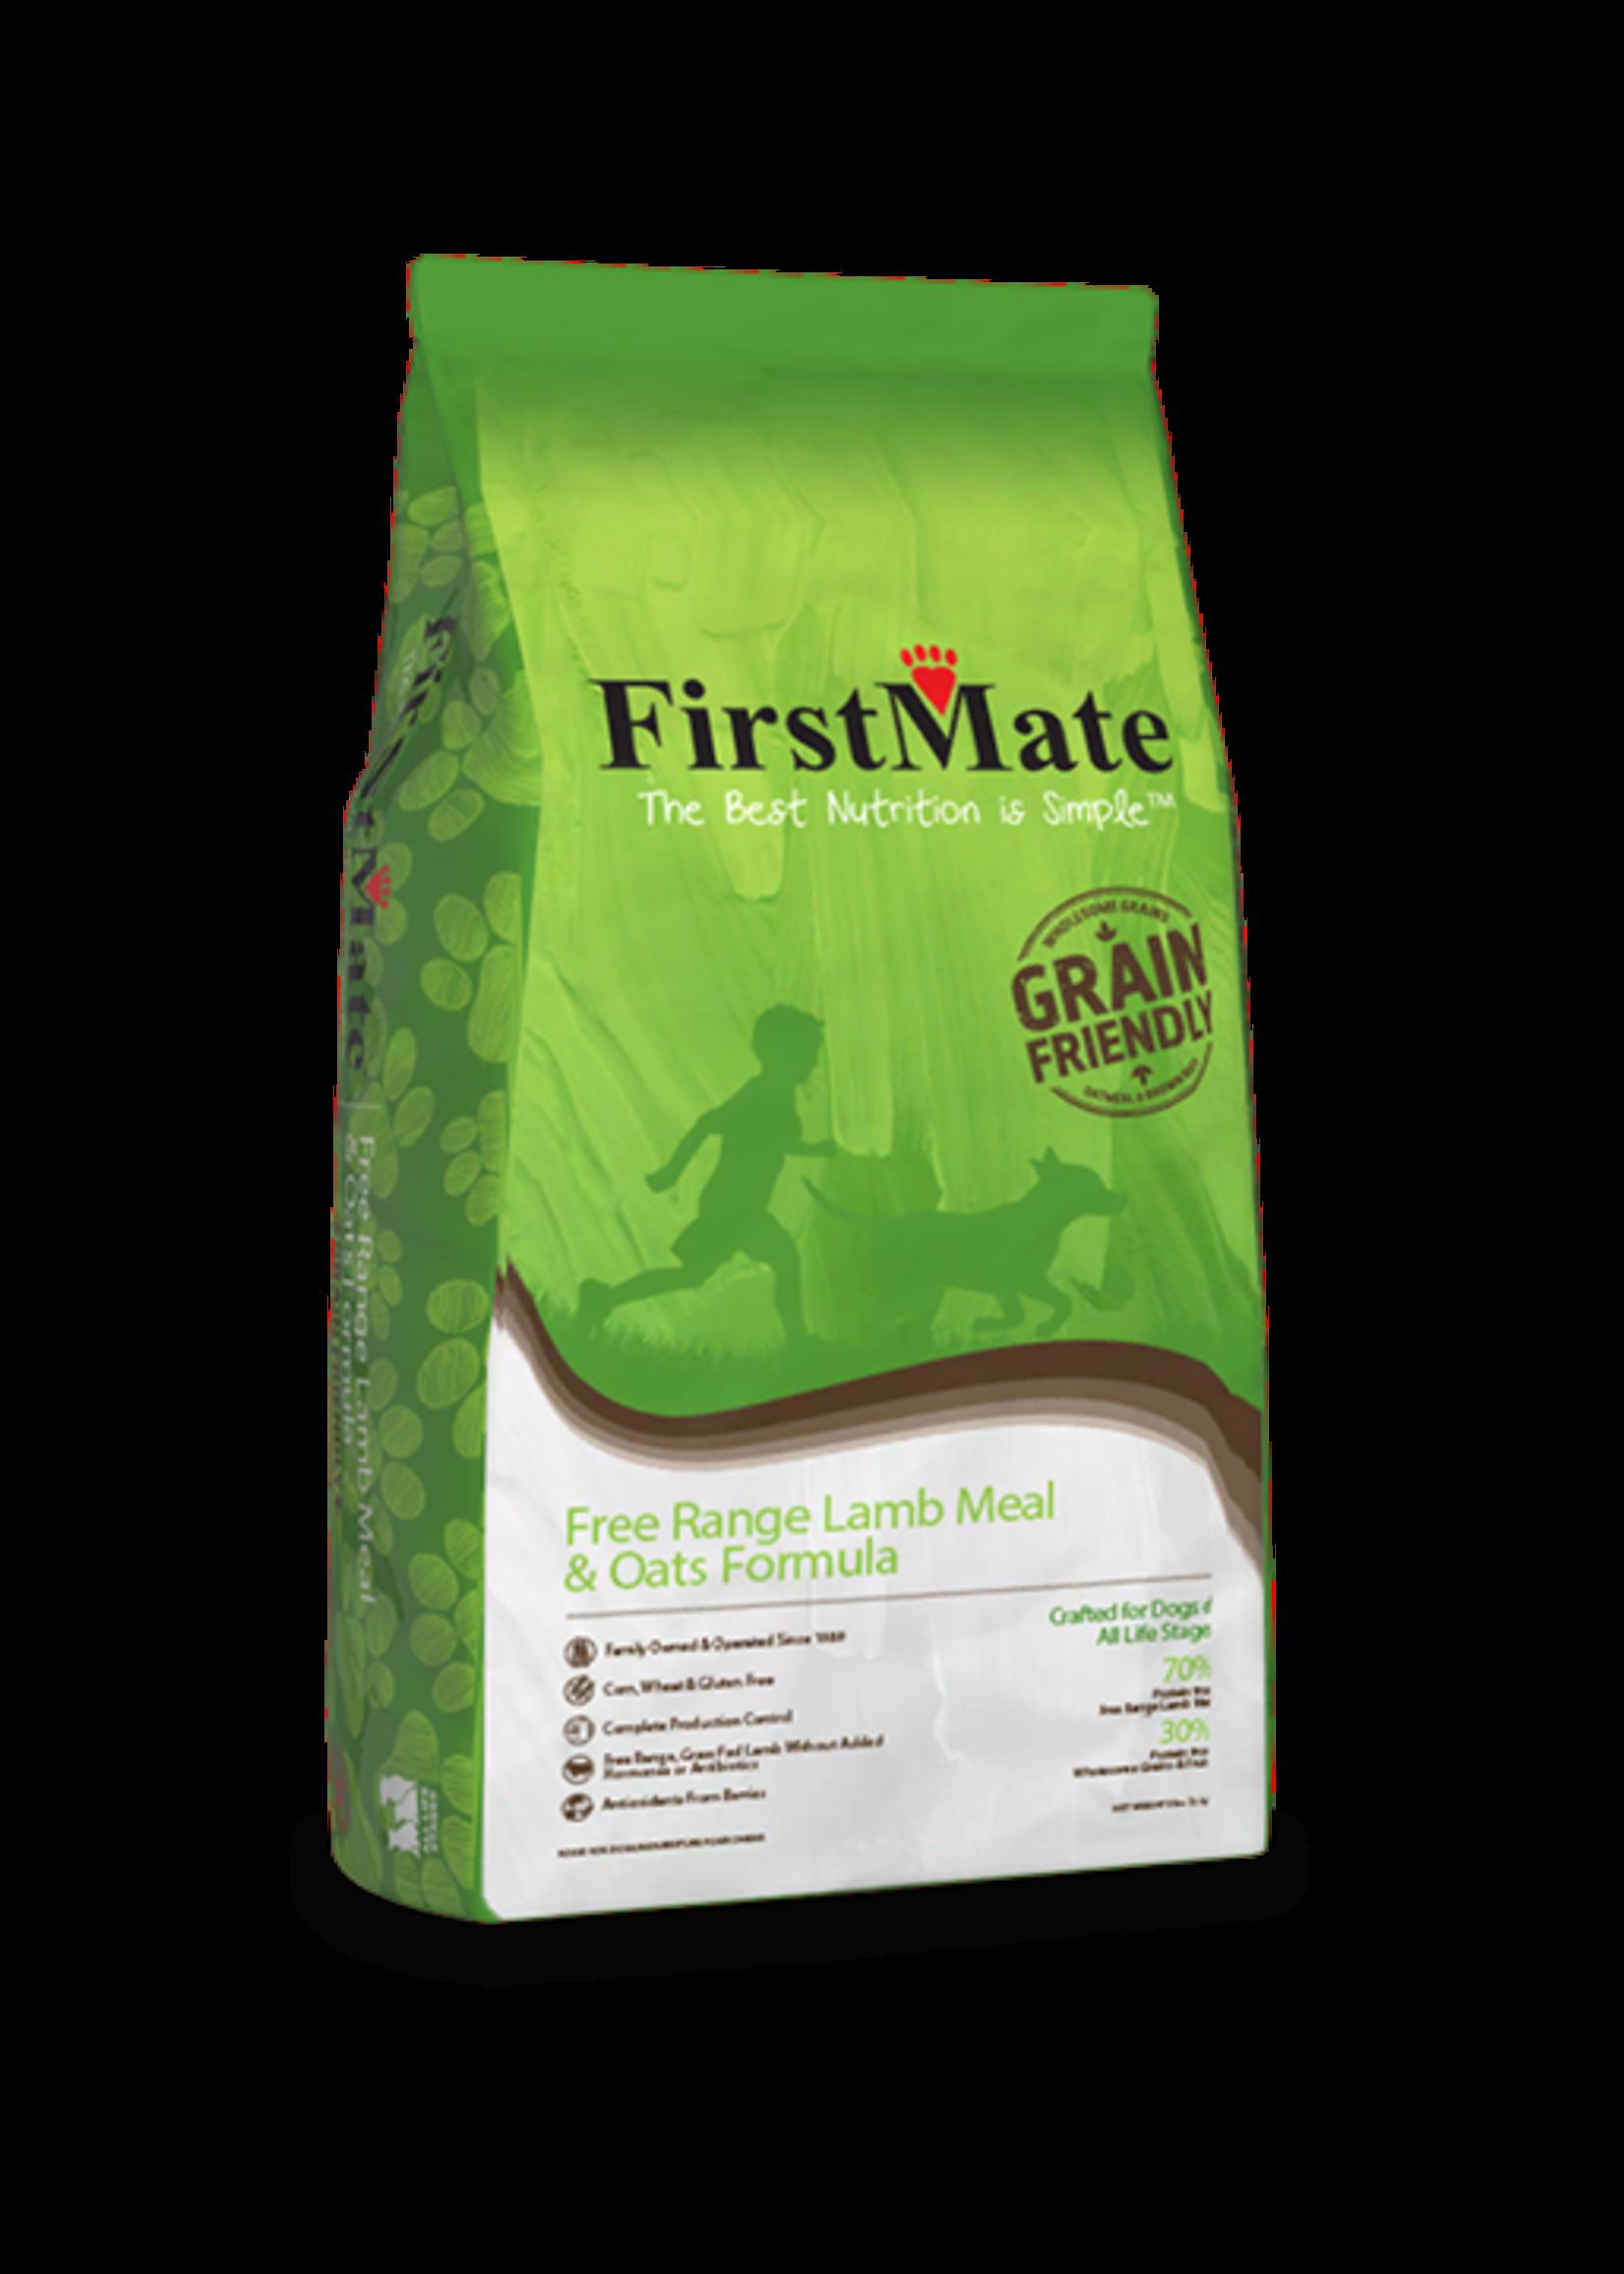 FirstMate FirstMate Free Range Lamb Meal & Oats Formula 5lbs